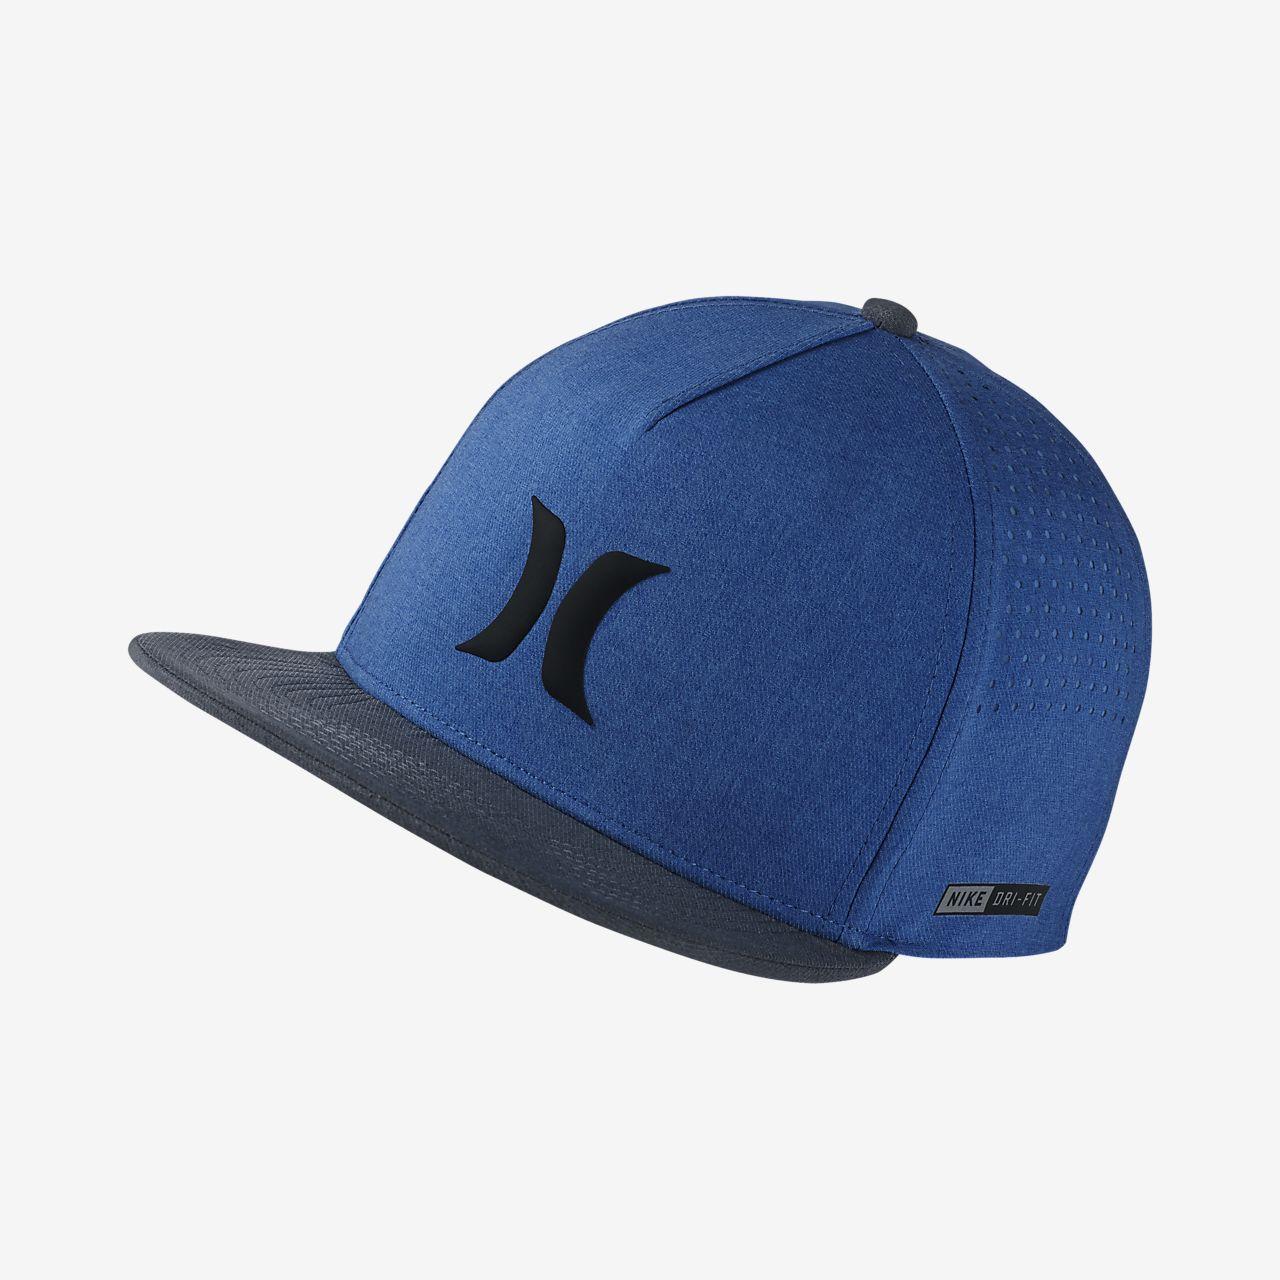 half off b252b 4ea2f ... best price hurley dri fit icon mens adjustable hat 2677c 18b31